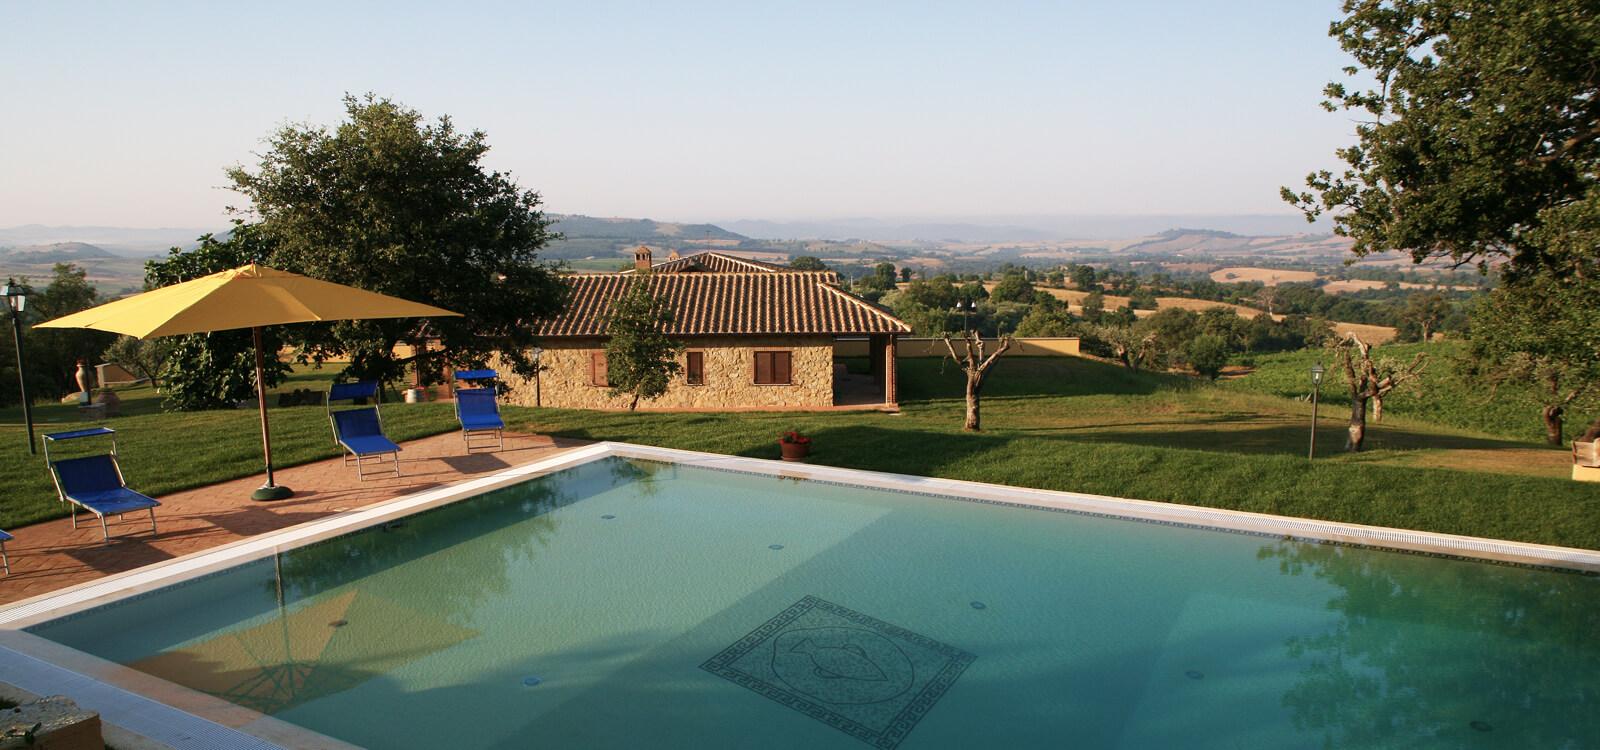 resort-vini-toscana-terenzi-viticolori-scansano